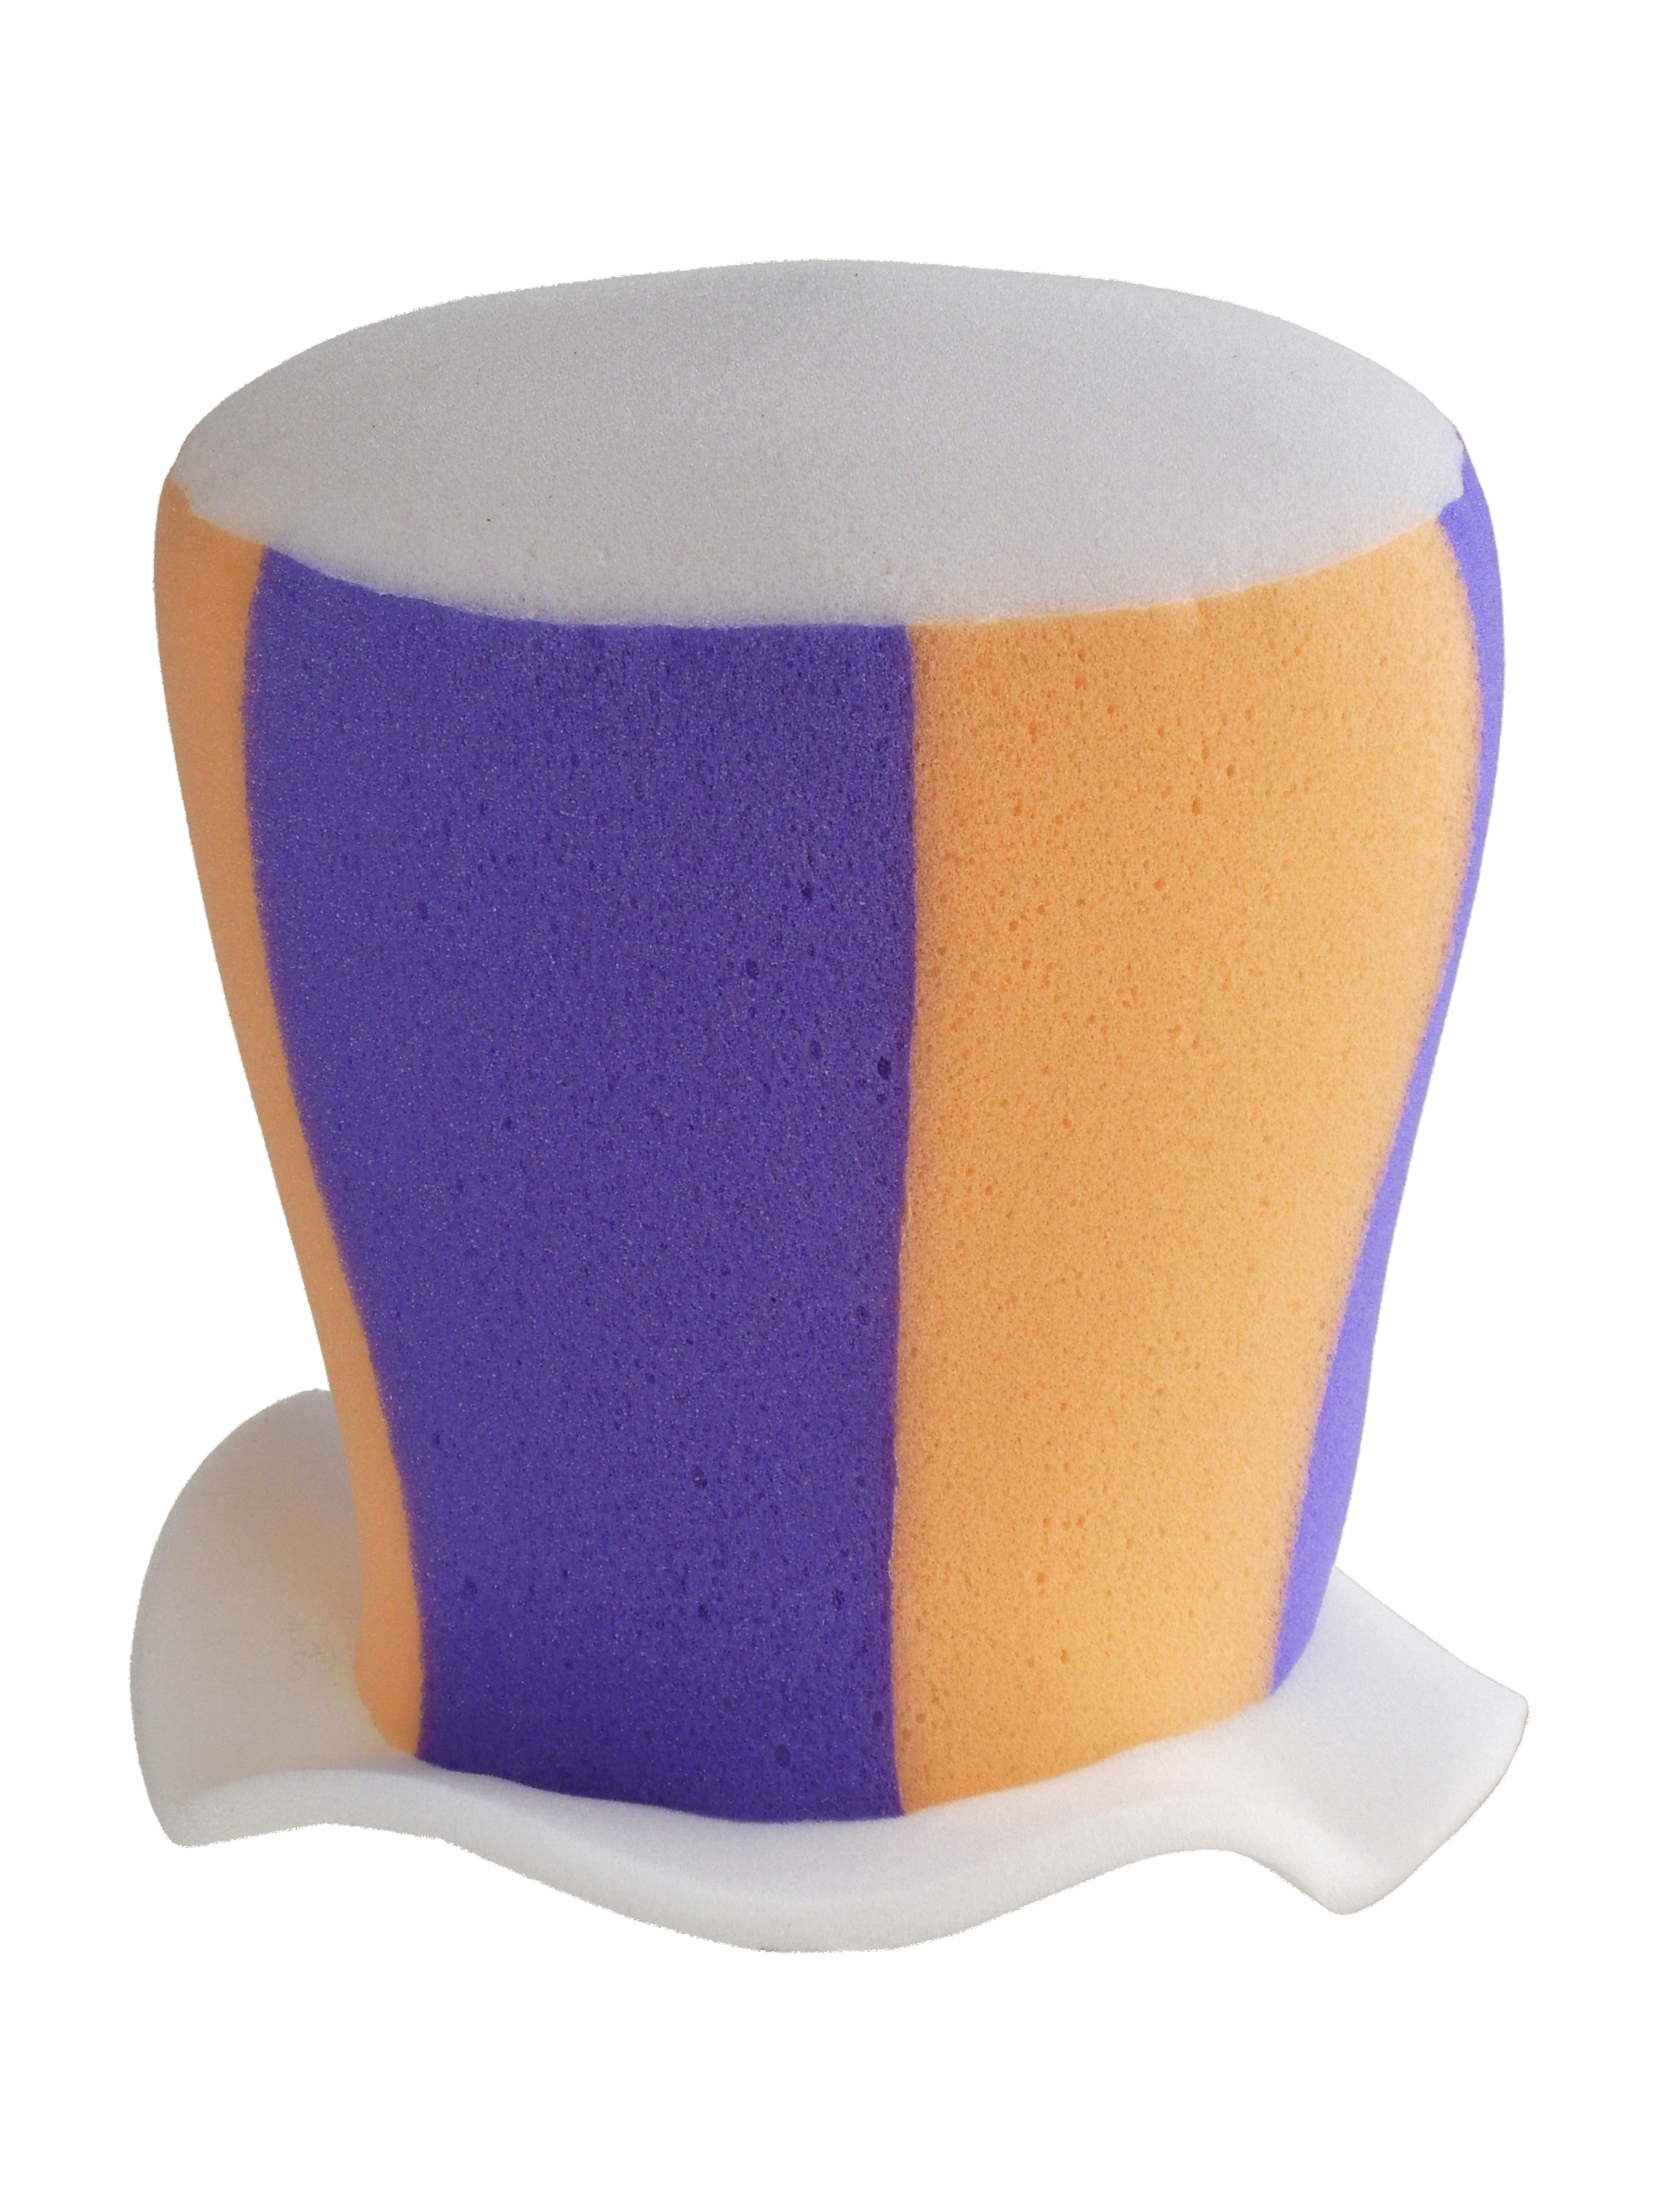 Como Fabricar Un Sombrero De Copa